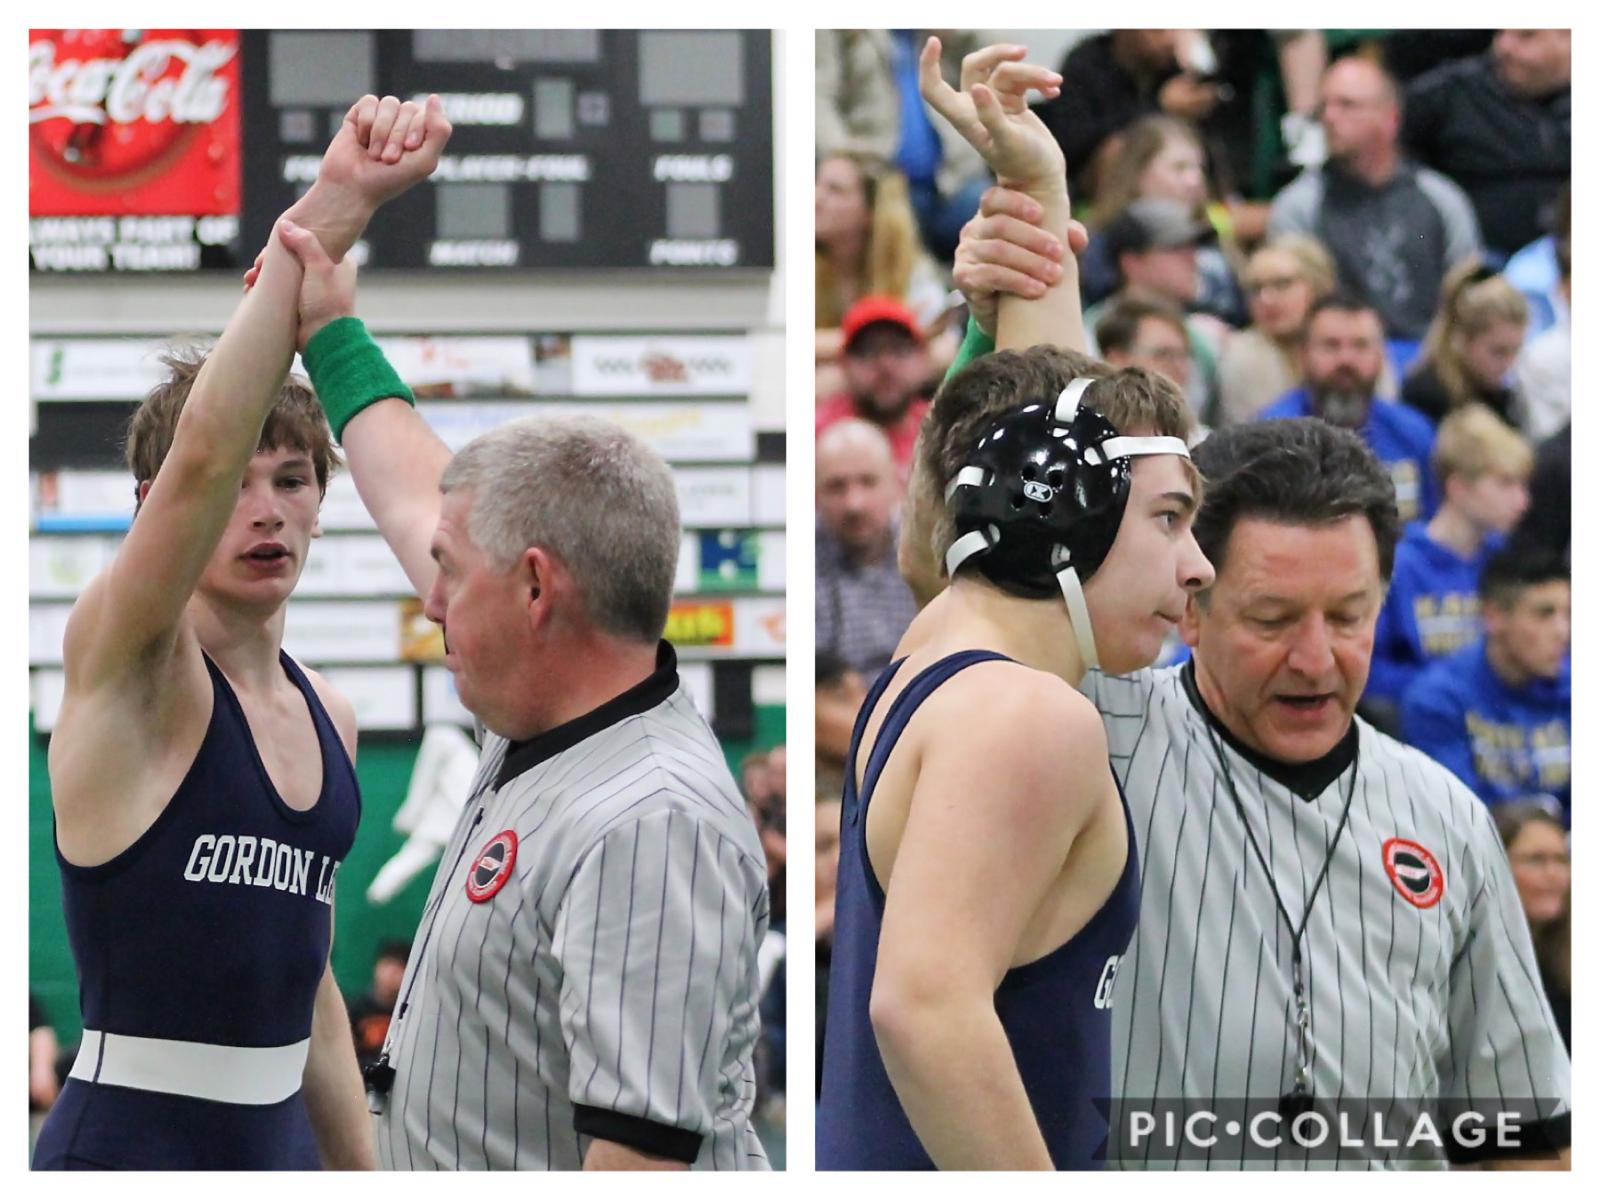 WRESTLING: Burnette, Penn place second in Knoxville